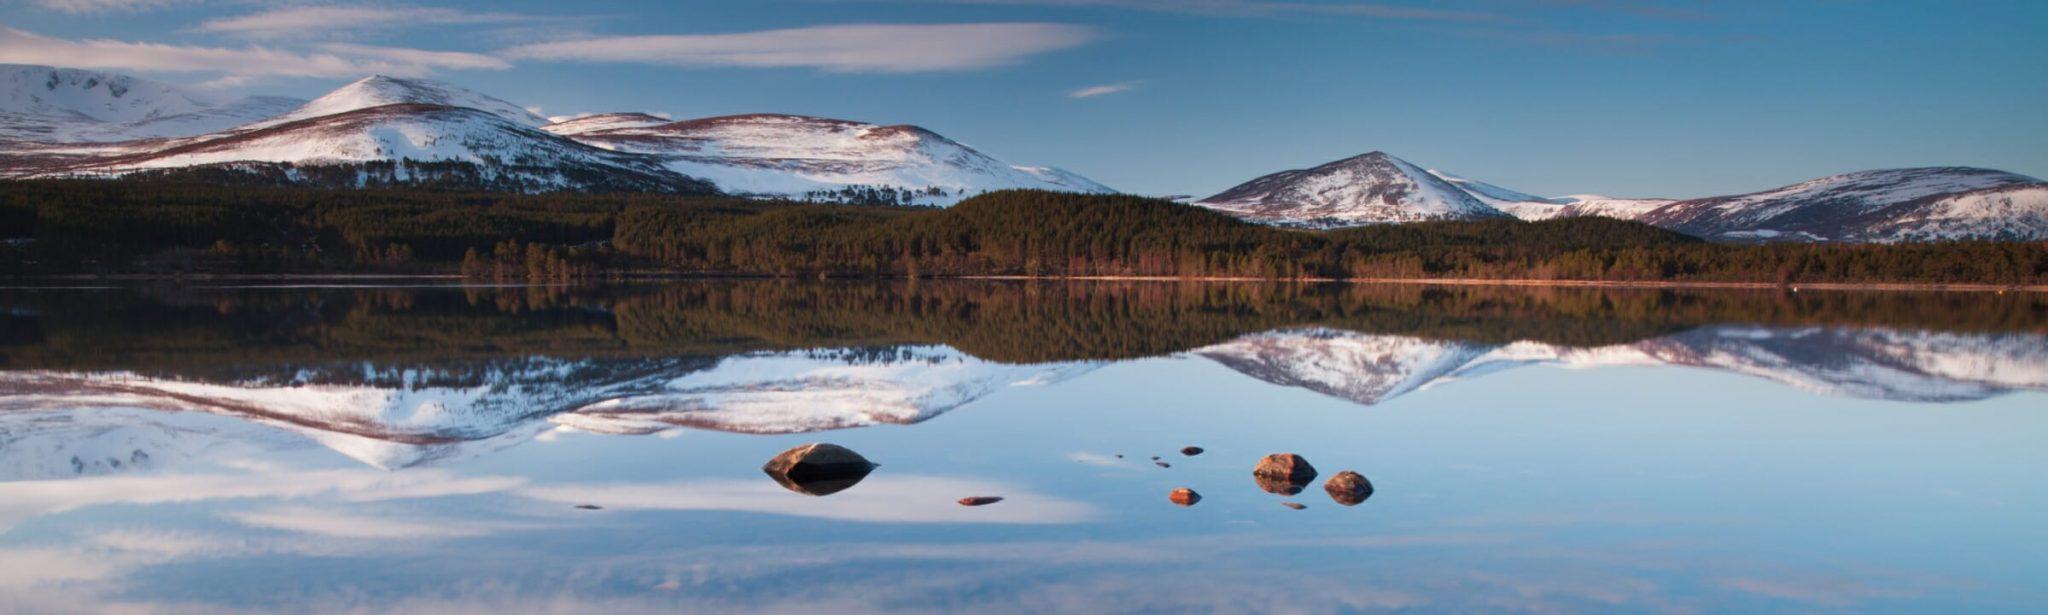 Loch Morlich Mirror